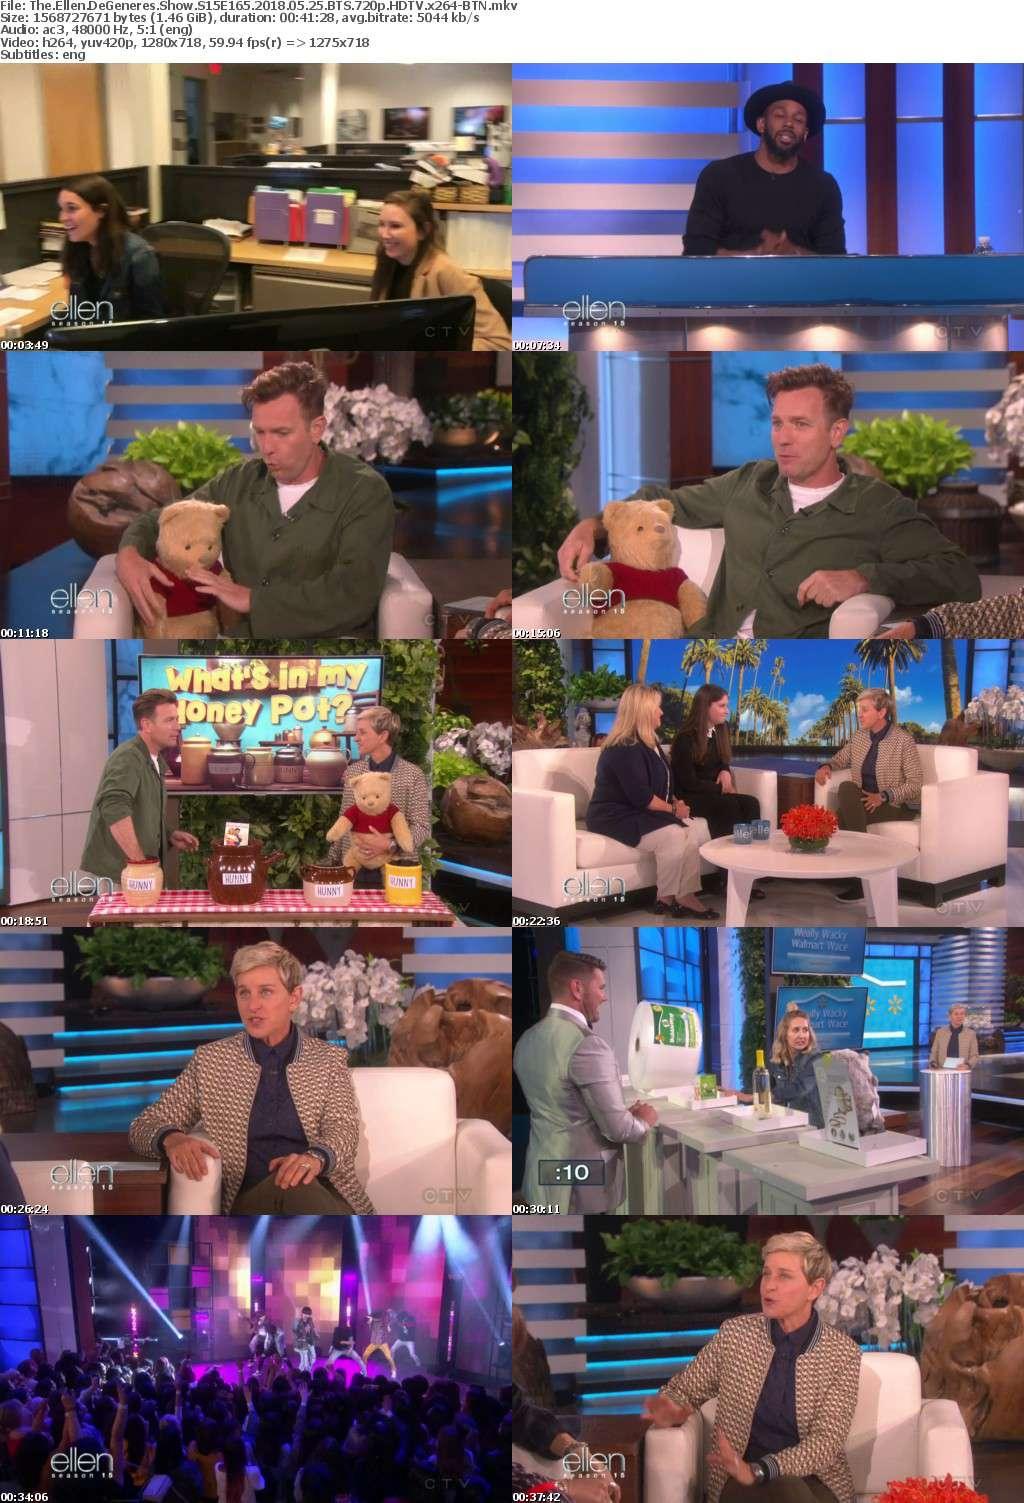 The Ellen DeGeneres Show S15E165 2018 05 25 BTS 720p HDTV x264-BTN